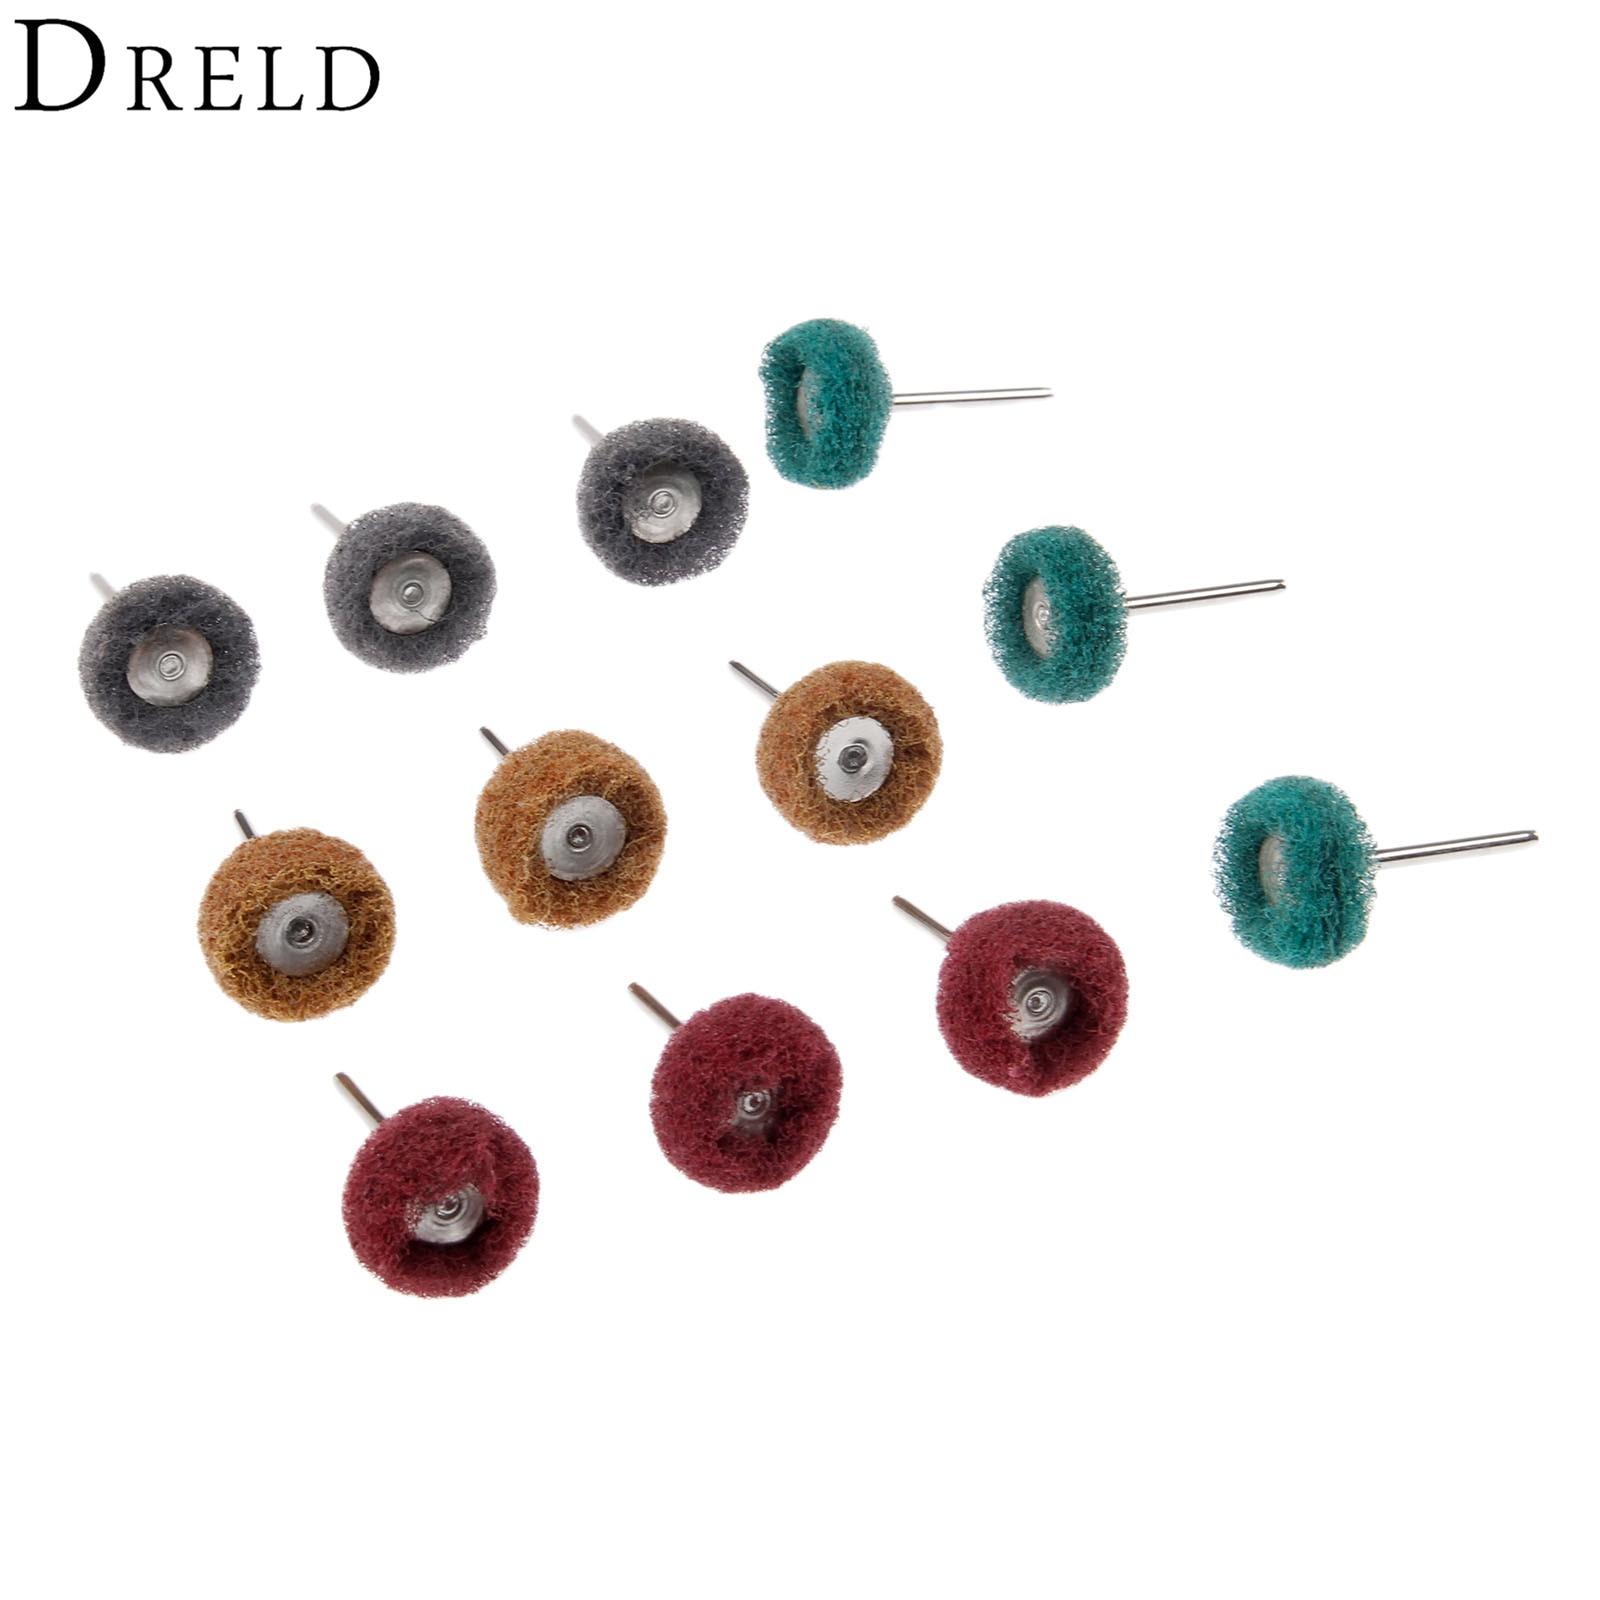 DRELD 12Pcs Dremel Accessories 25mm Abrasive Brush Metal Surface Grinding Buffing Polishing Wheel Set 3mm Shank For Rotary Tool